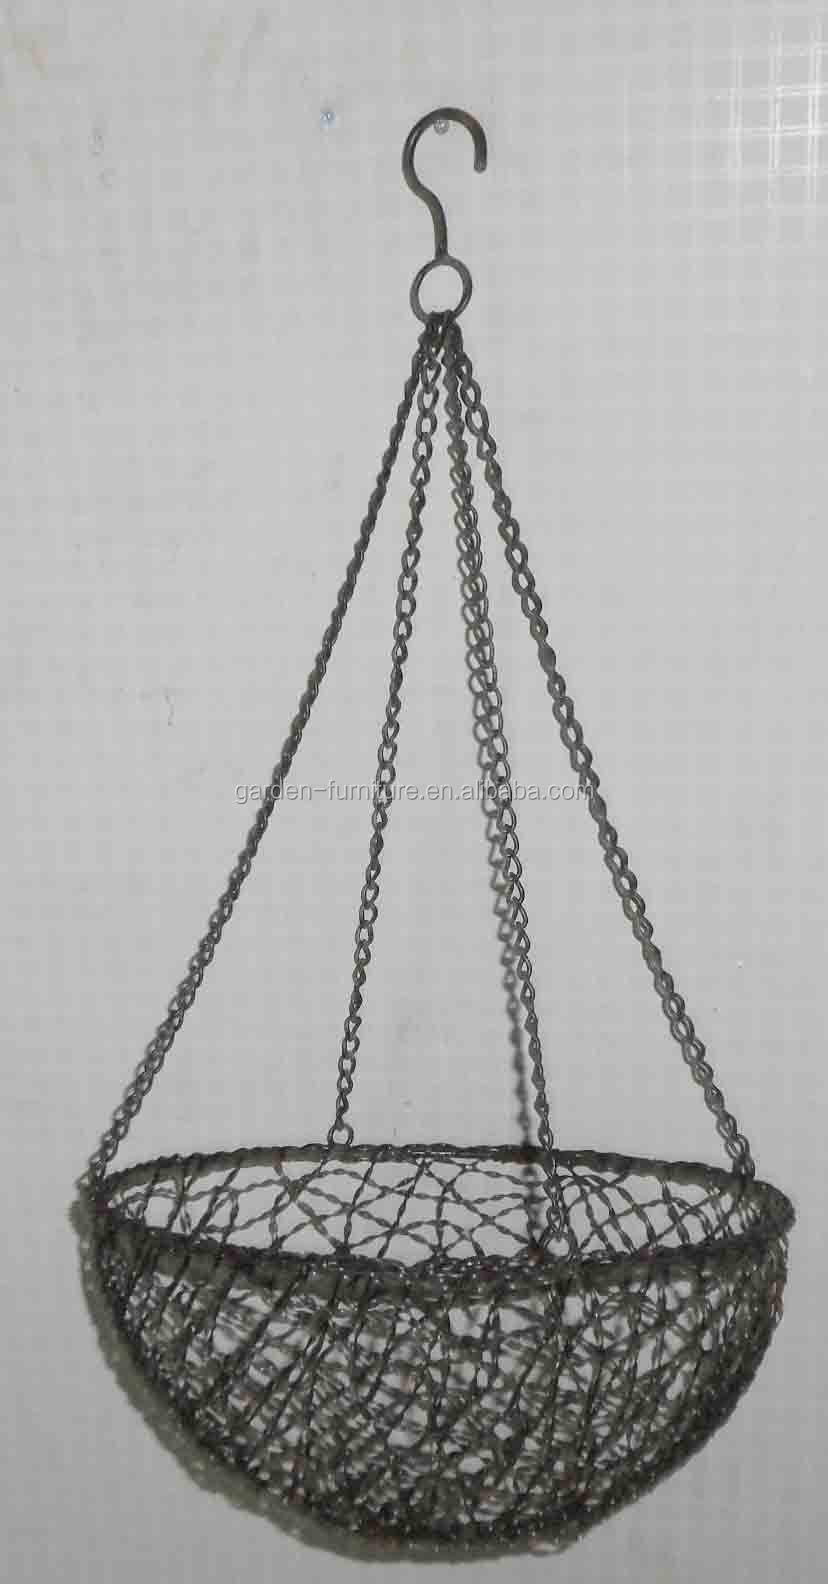 Handicraft Decorative Metal Planter Fruit Bowl Wrought